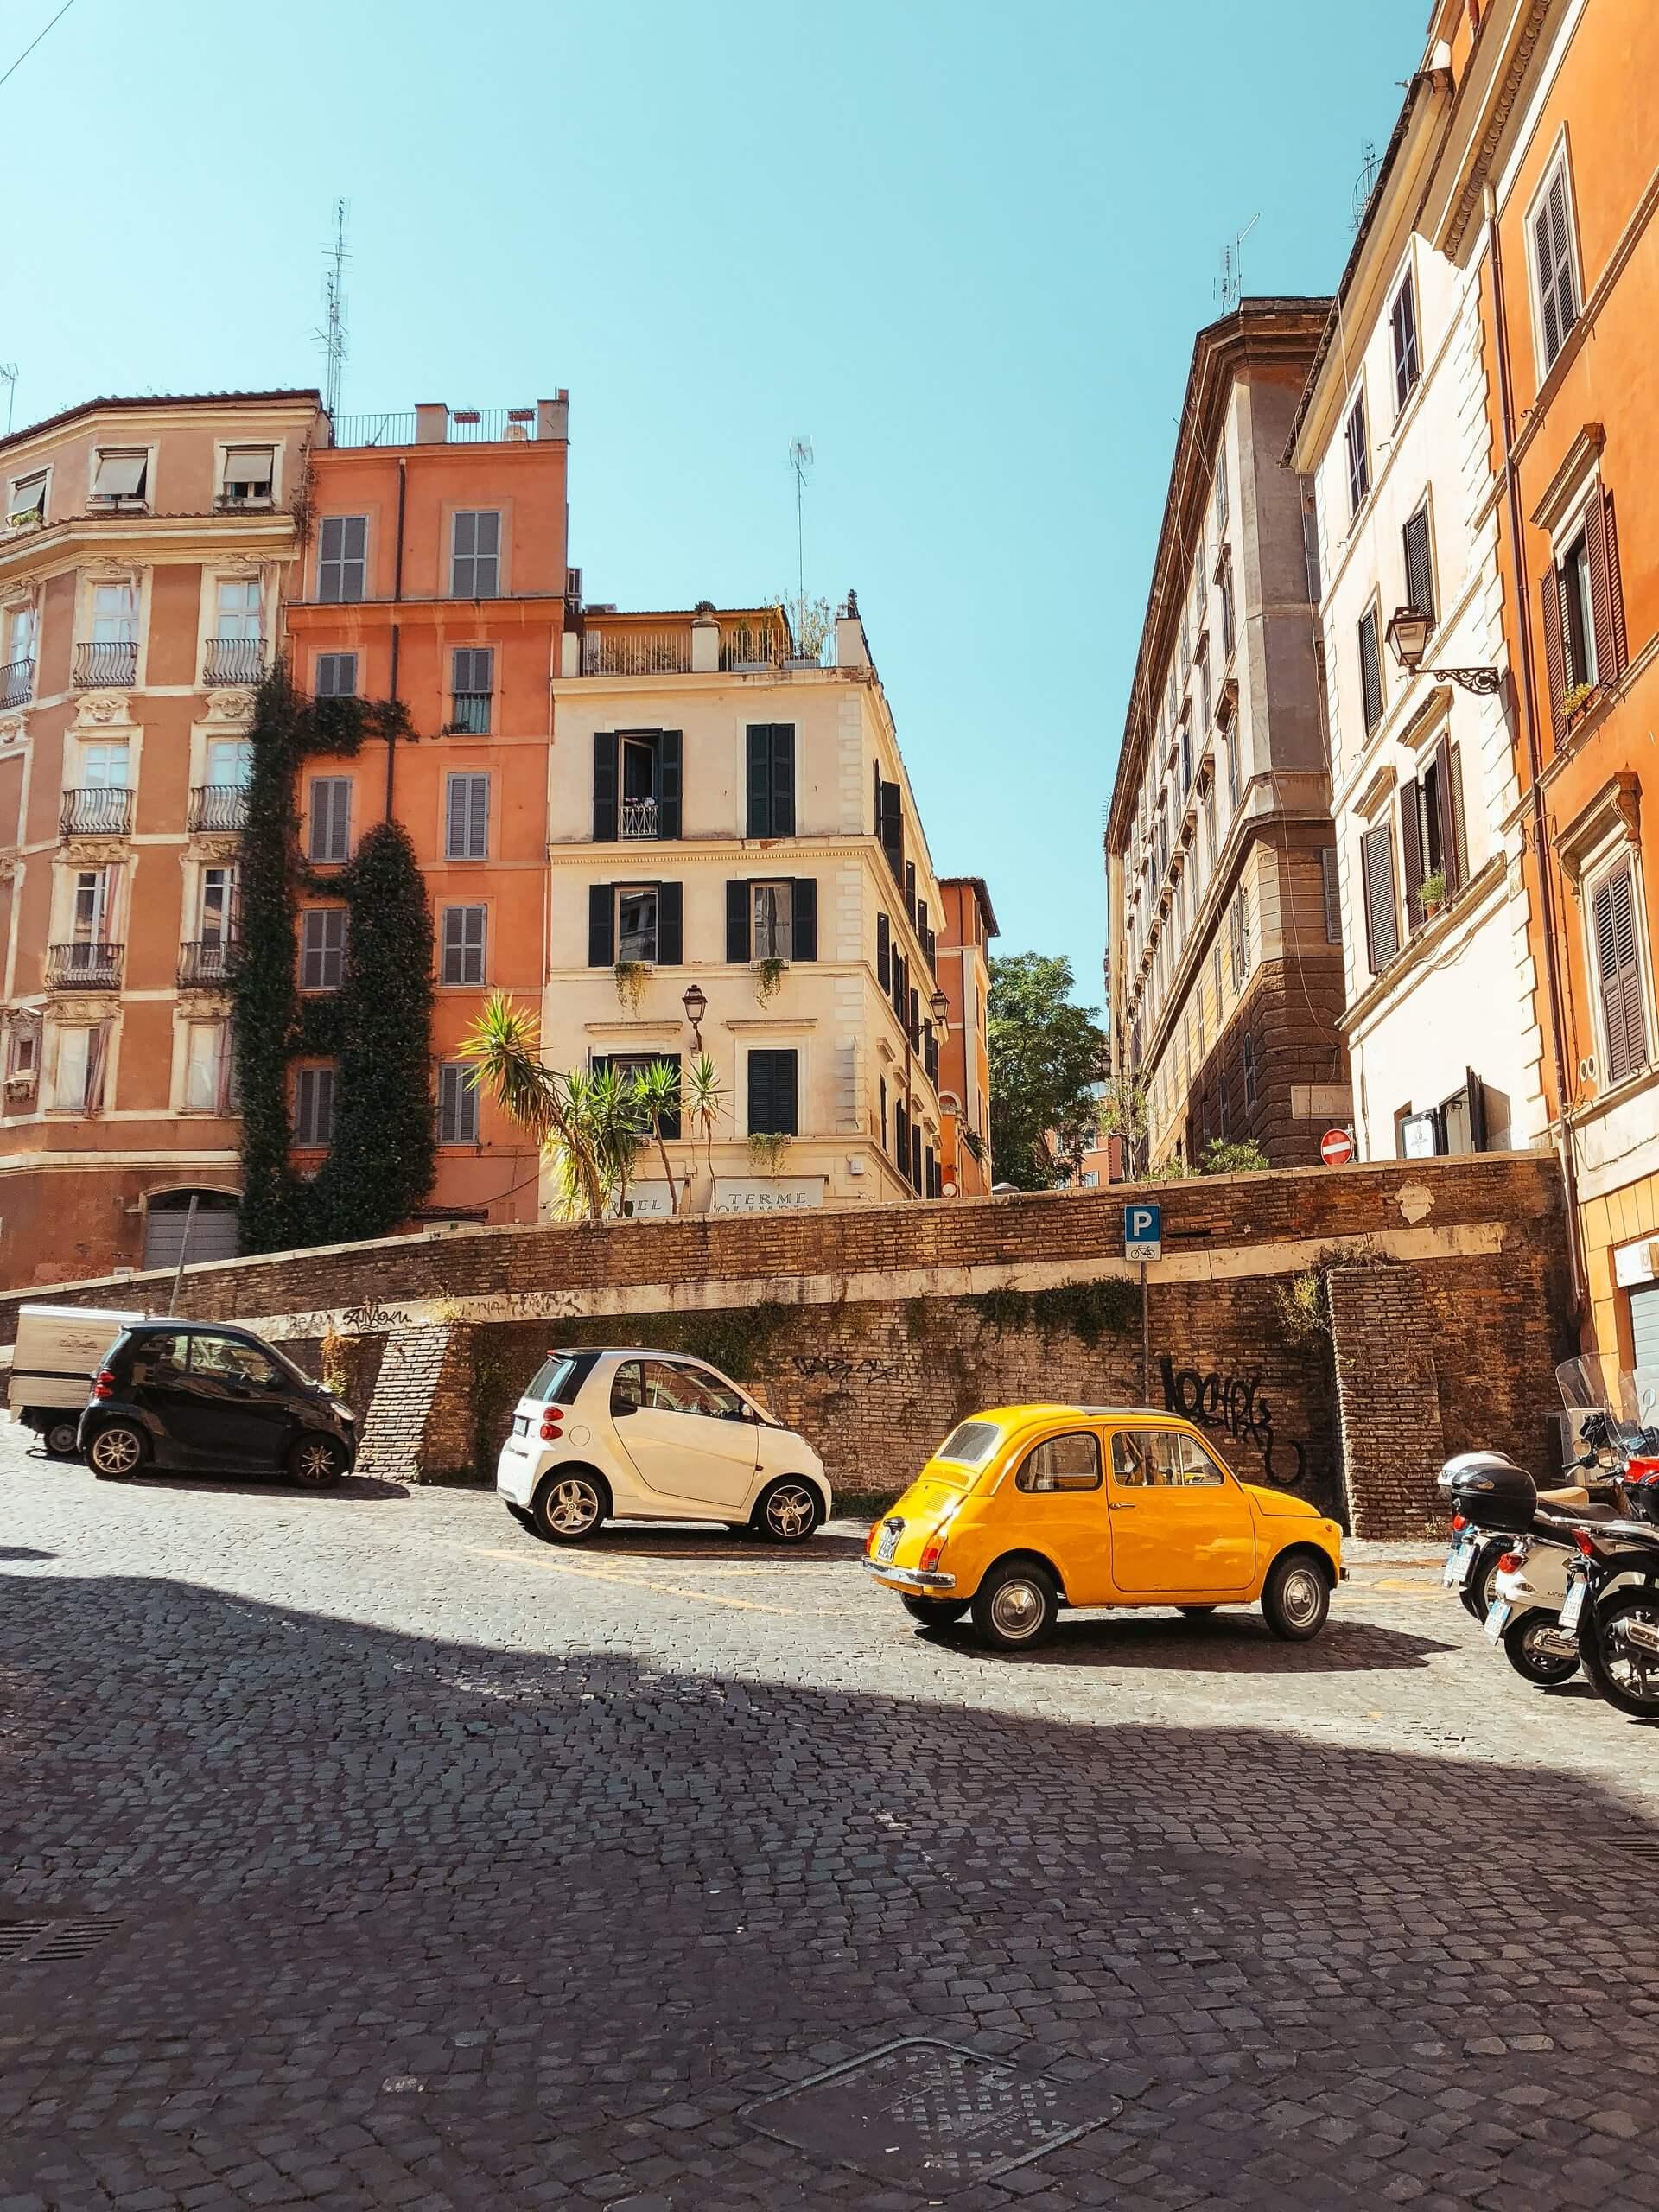 Italian life